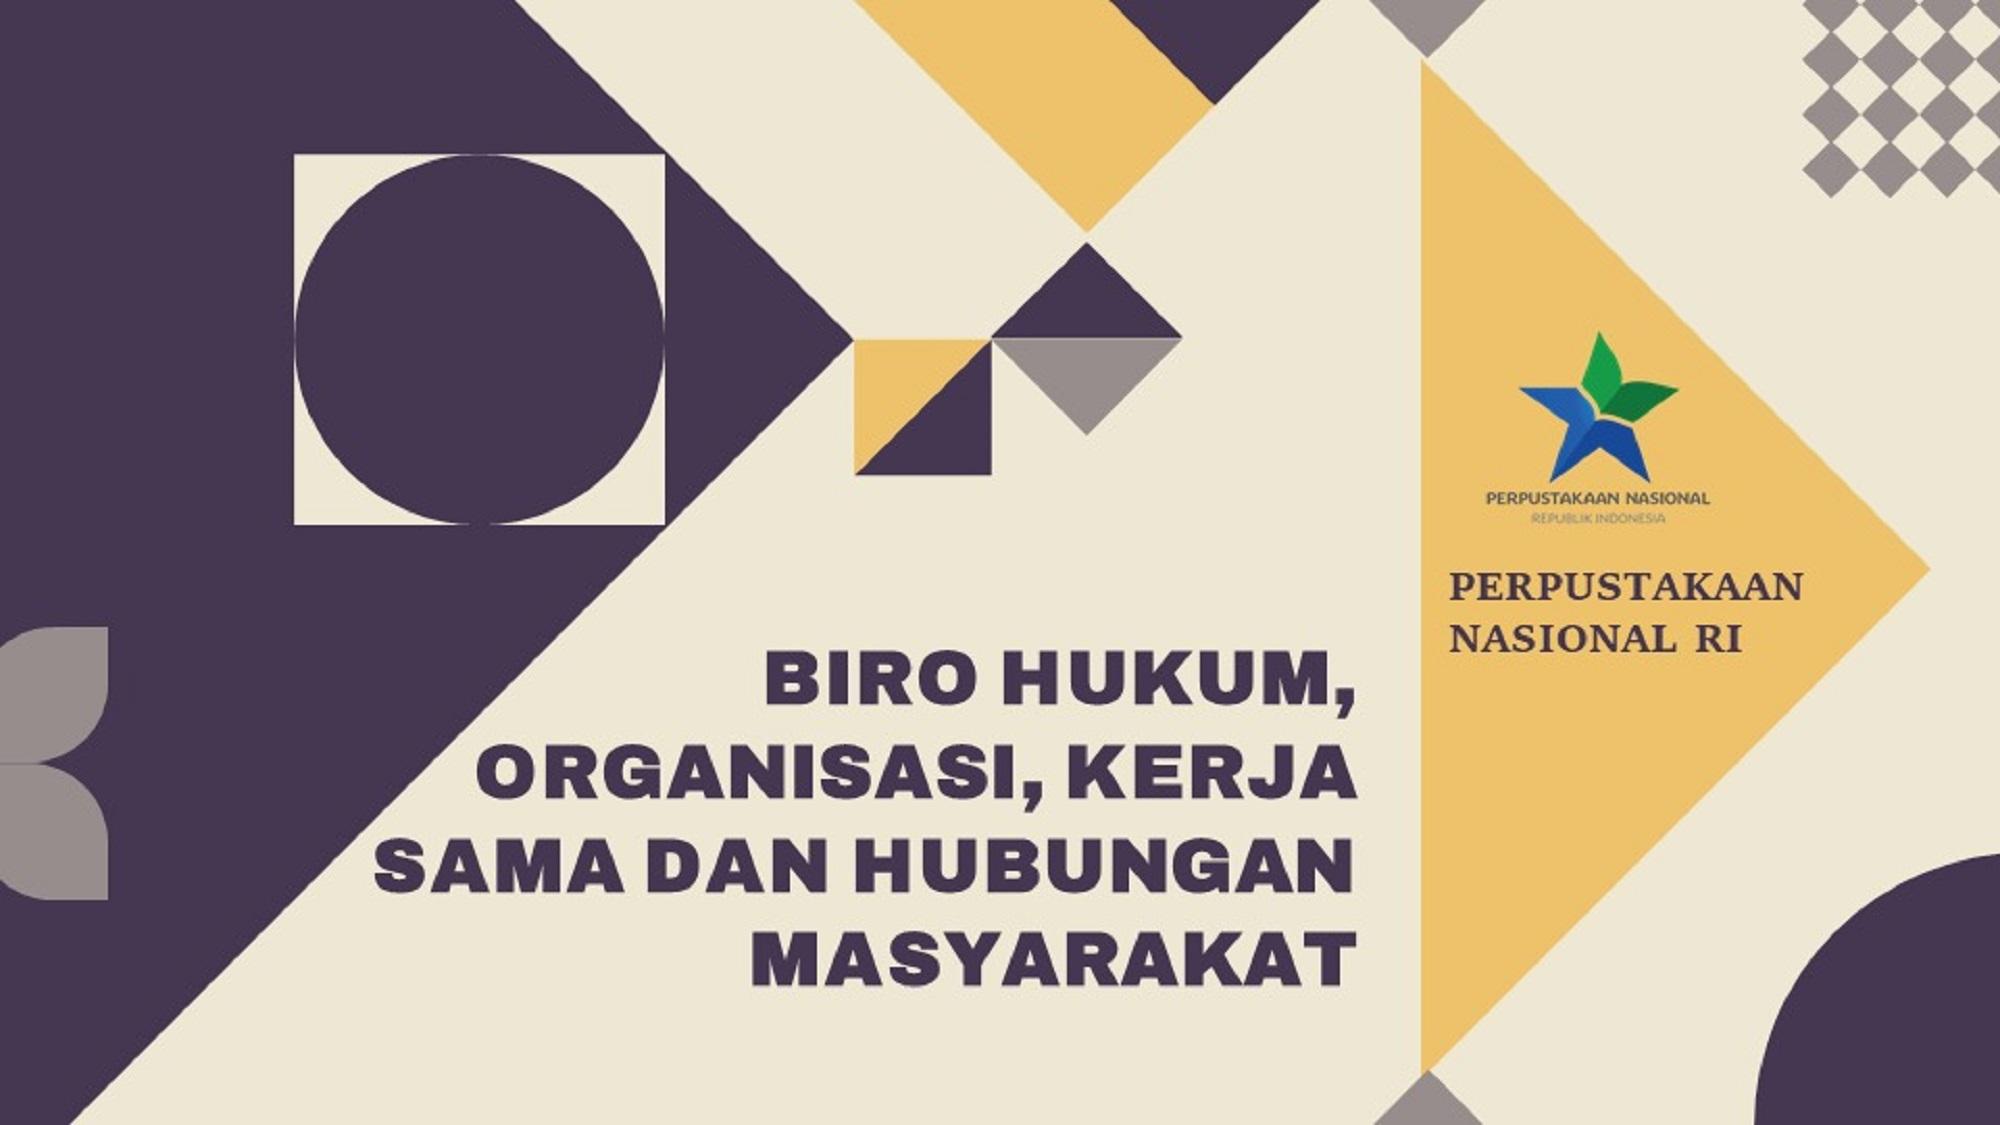 Rapat Harmonisasi Rancangan Peraturan Perpustakaan Nasional tentang Pelimpahan Dekonsentrasi-27 November 2020